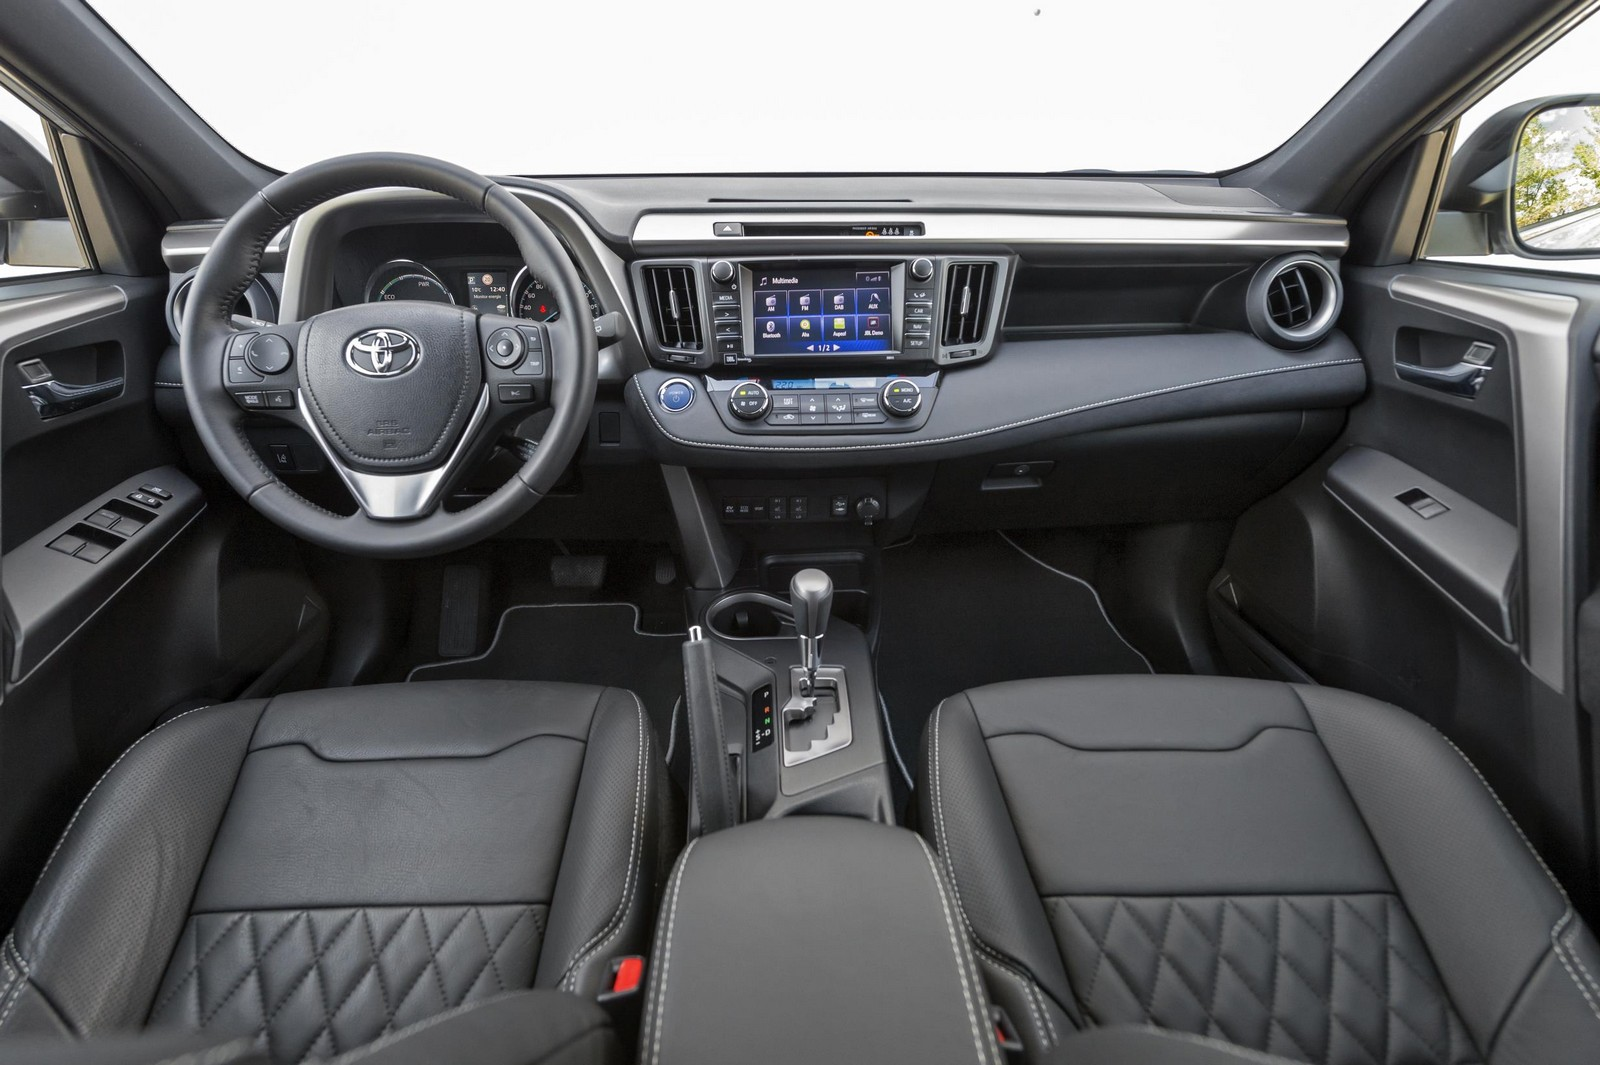 Foto Interiores 1 Toyota Rav4 Hybrid Feel Edition Suv Todocamino 2017